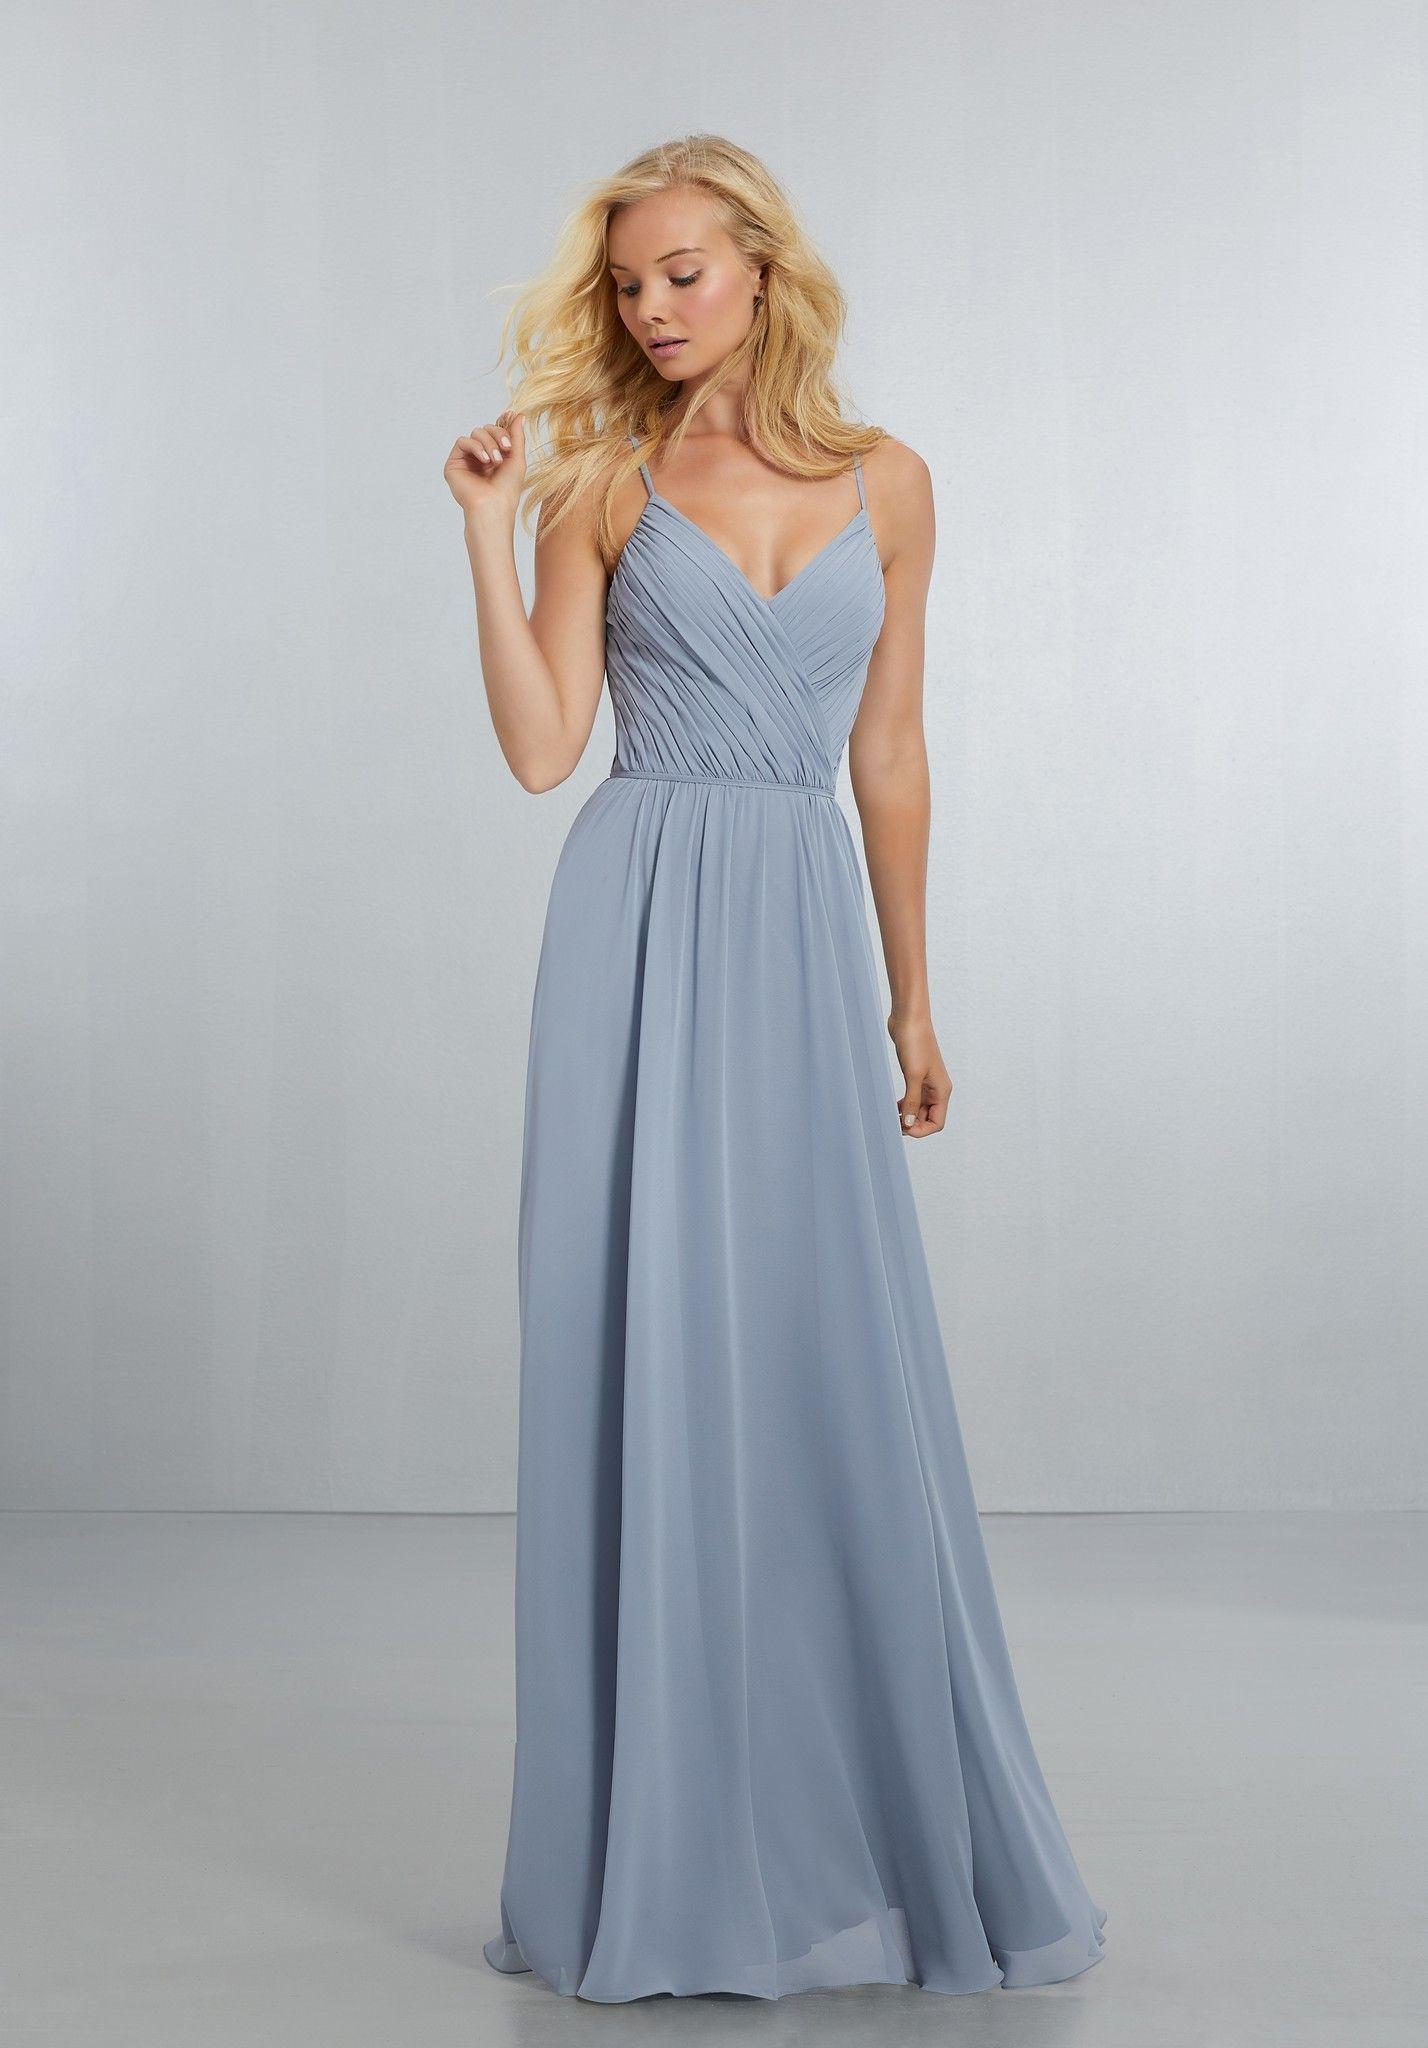 56a5b0d94721f Chiffon Bridesmaids Dress with Draped V-Neck Bodice and Keyhole Back ...